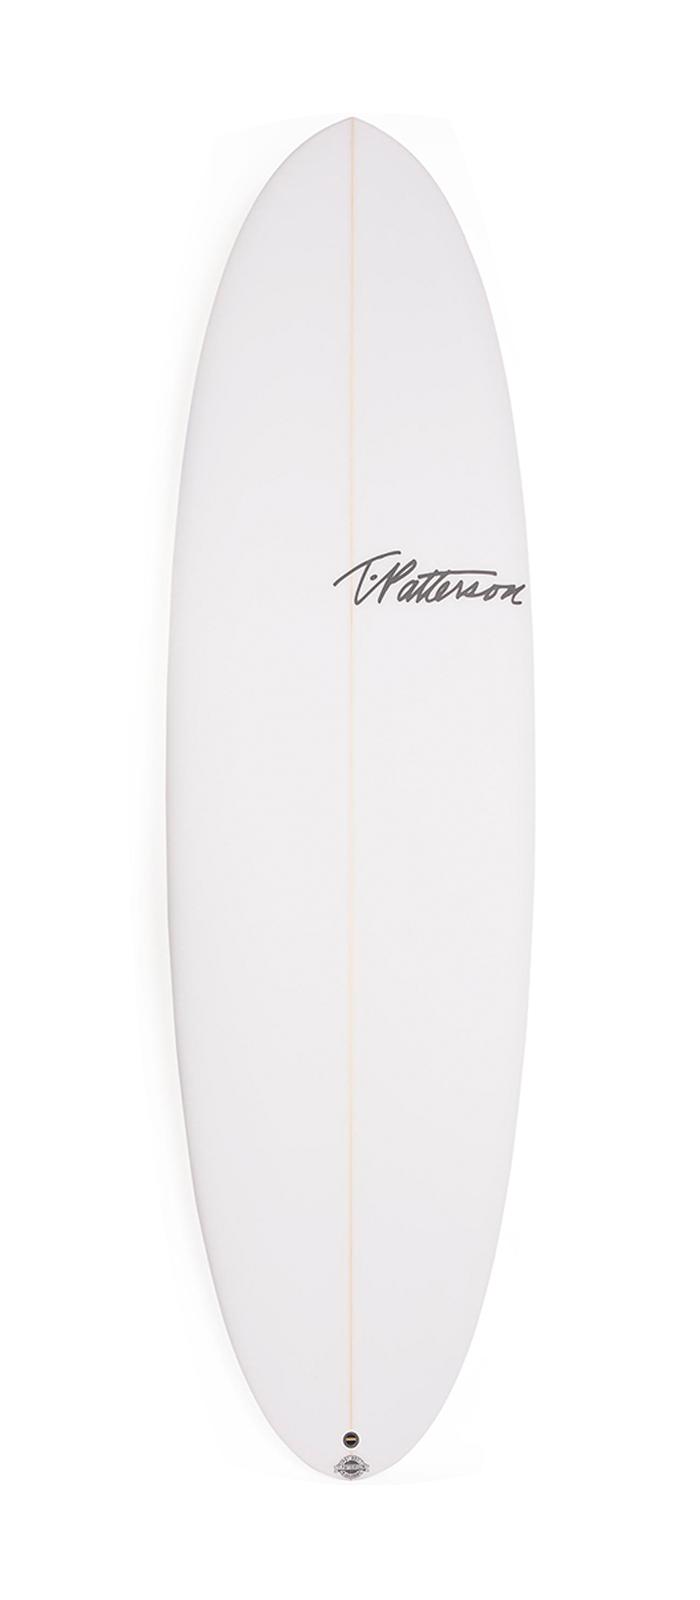 The Pill surfboard model